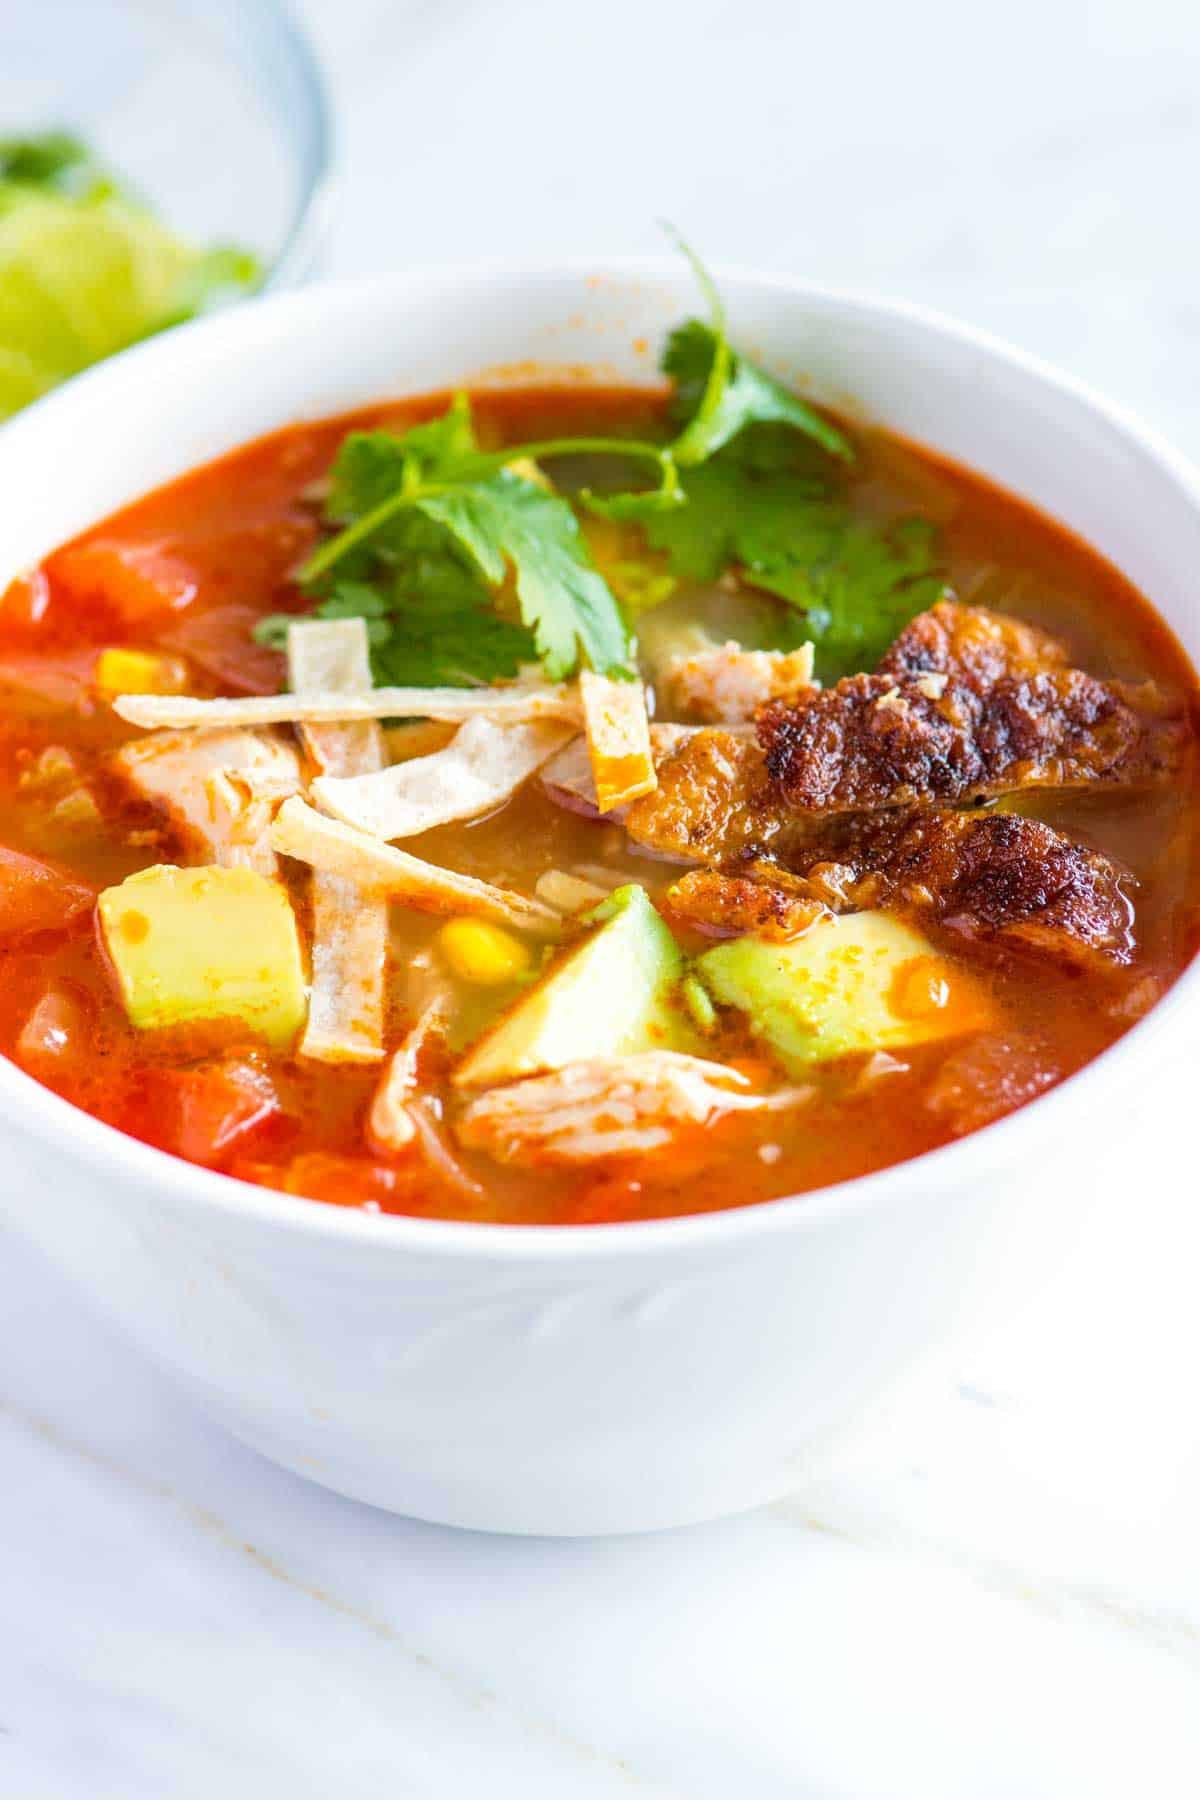 Best Chicken Tortilla Soup  Easy Chicken Tortilla Soup Recipe from Scratch